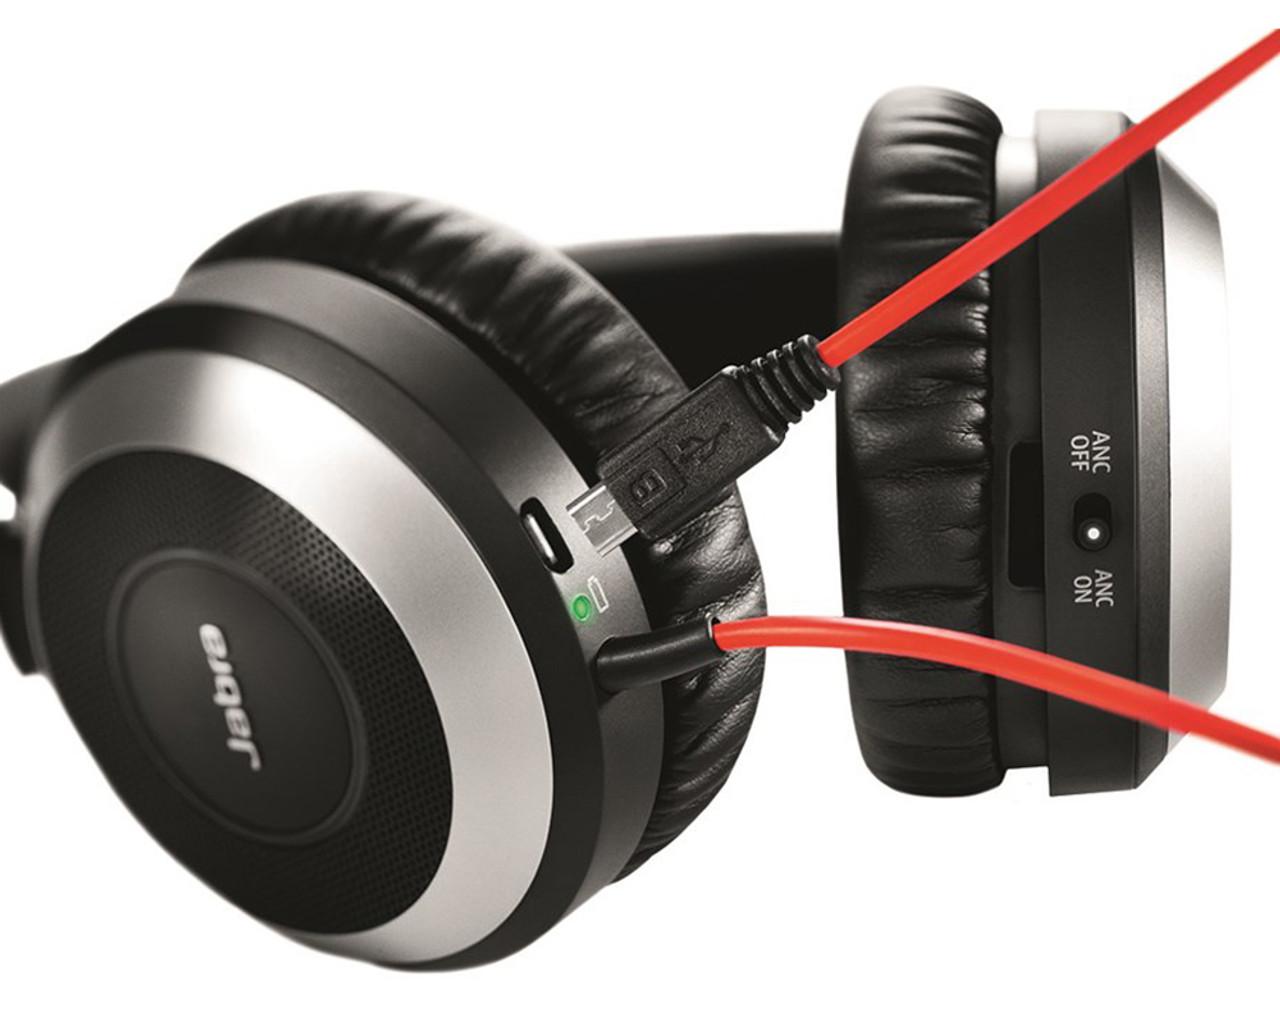 Jabra Evolve 80 Headsets Plus Store